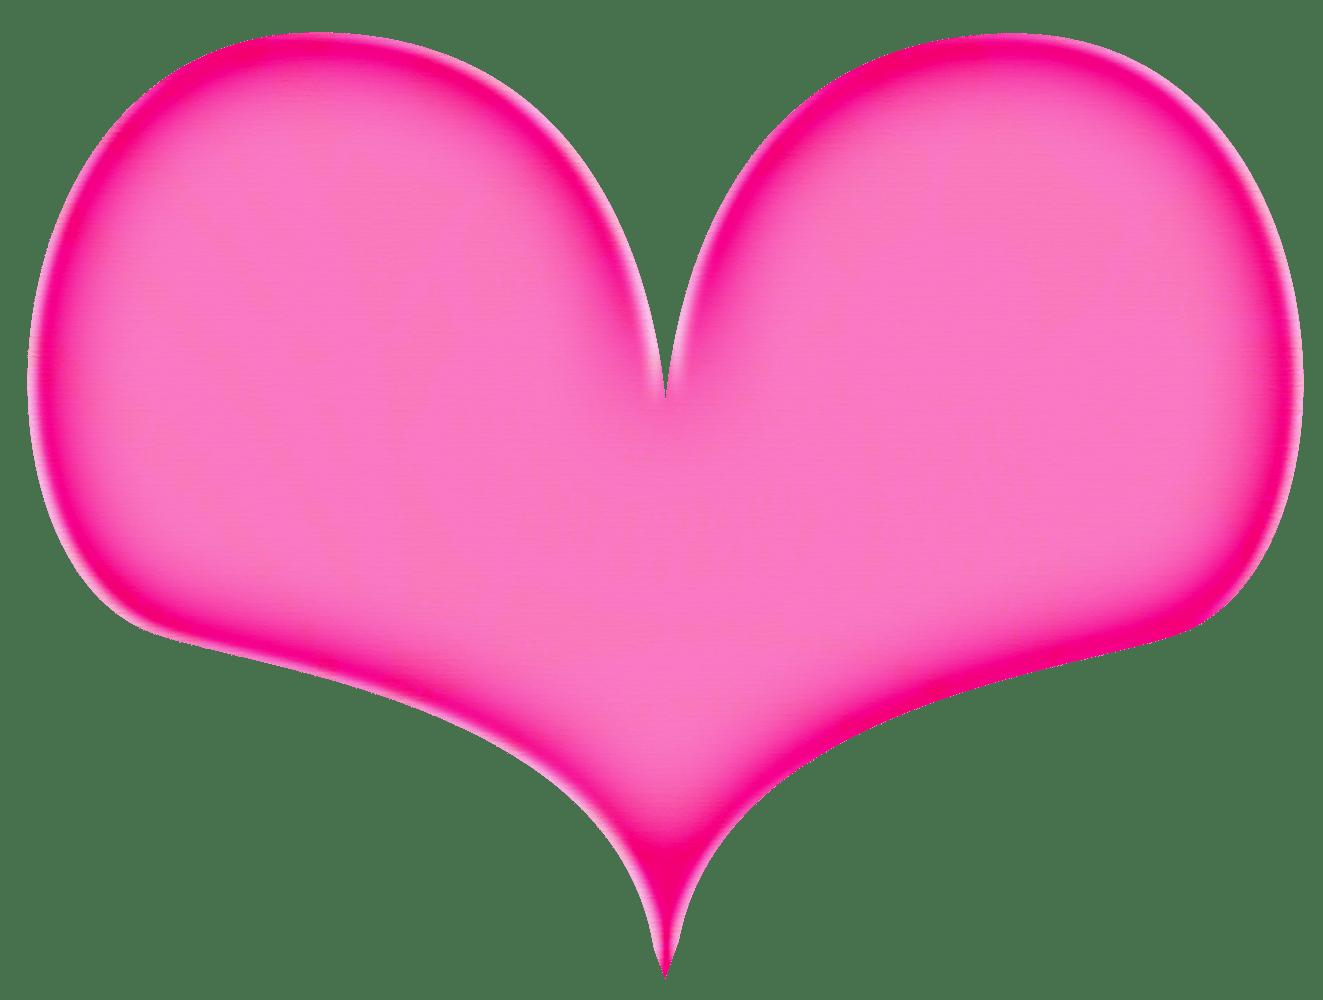 hight resolution of 1323x1000 pink heart beat line clipart